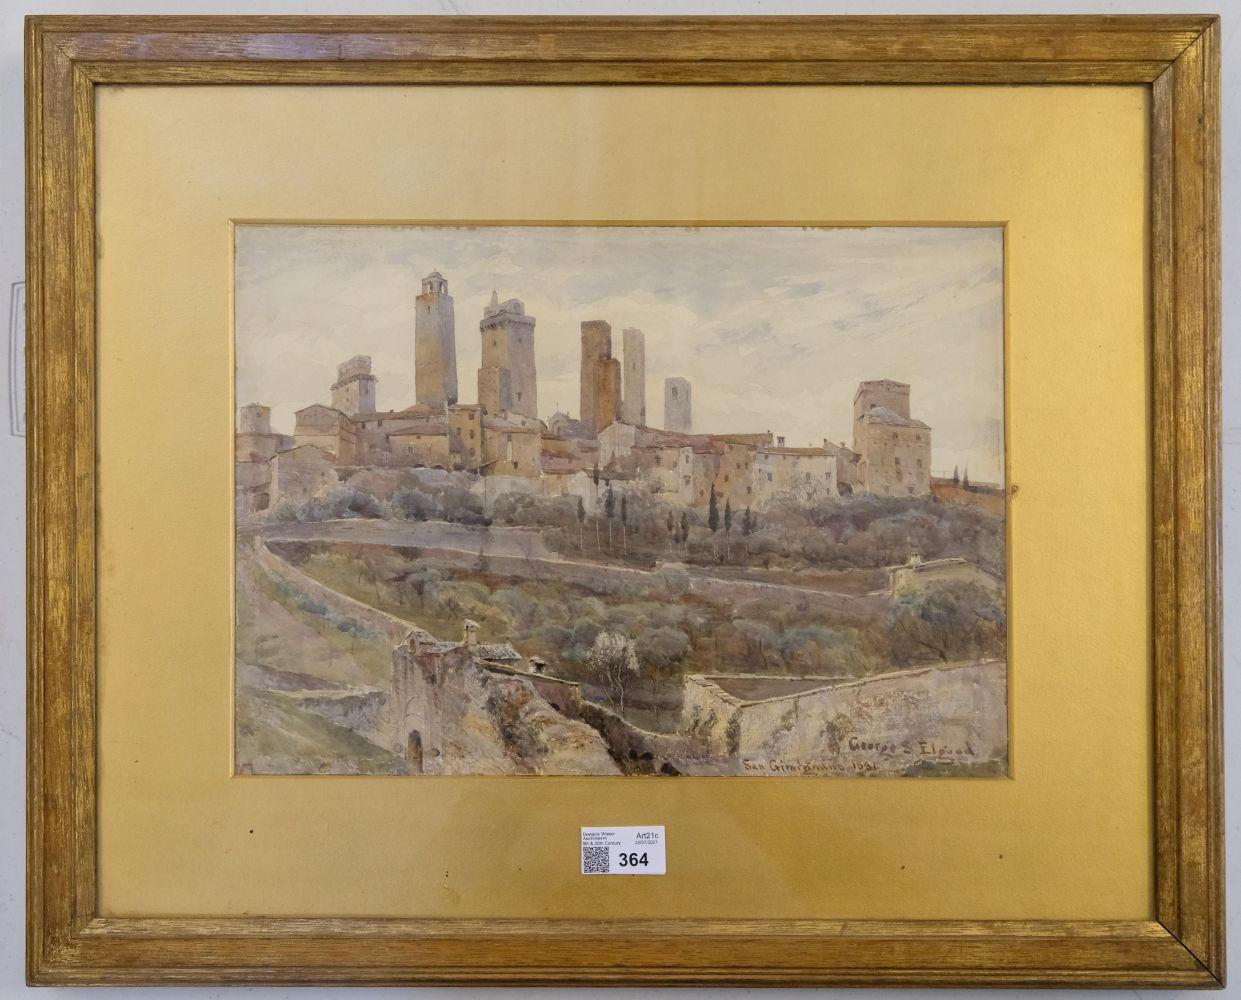 * Elgood (George S., 1851-1943). San Gimignano, 1881 - Image 2 of 6